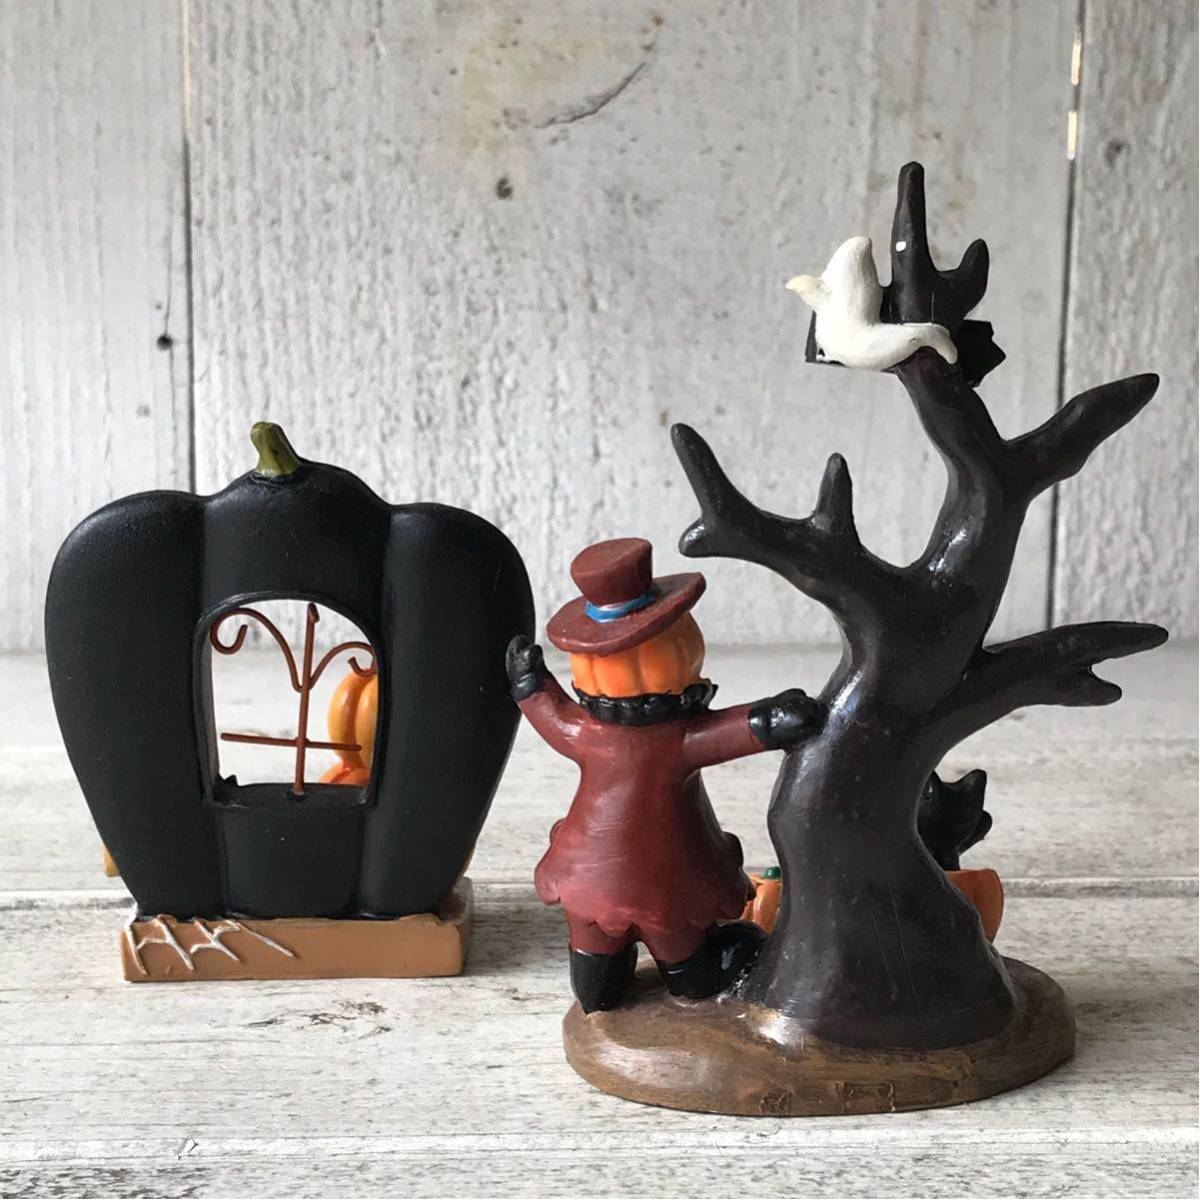 Halloween Hello wing Halo we n miscellaneous goods interior objet d'art pumpkin small articles ornament set door tree ww